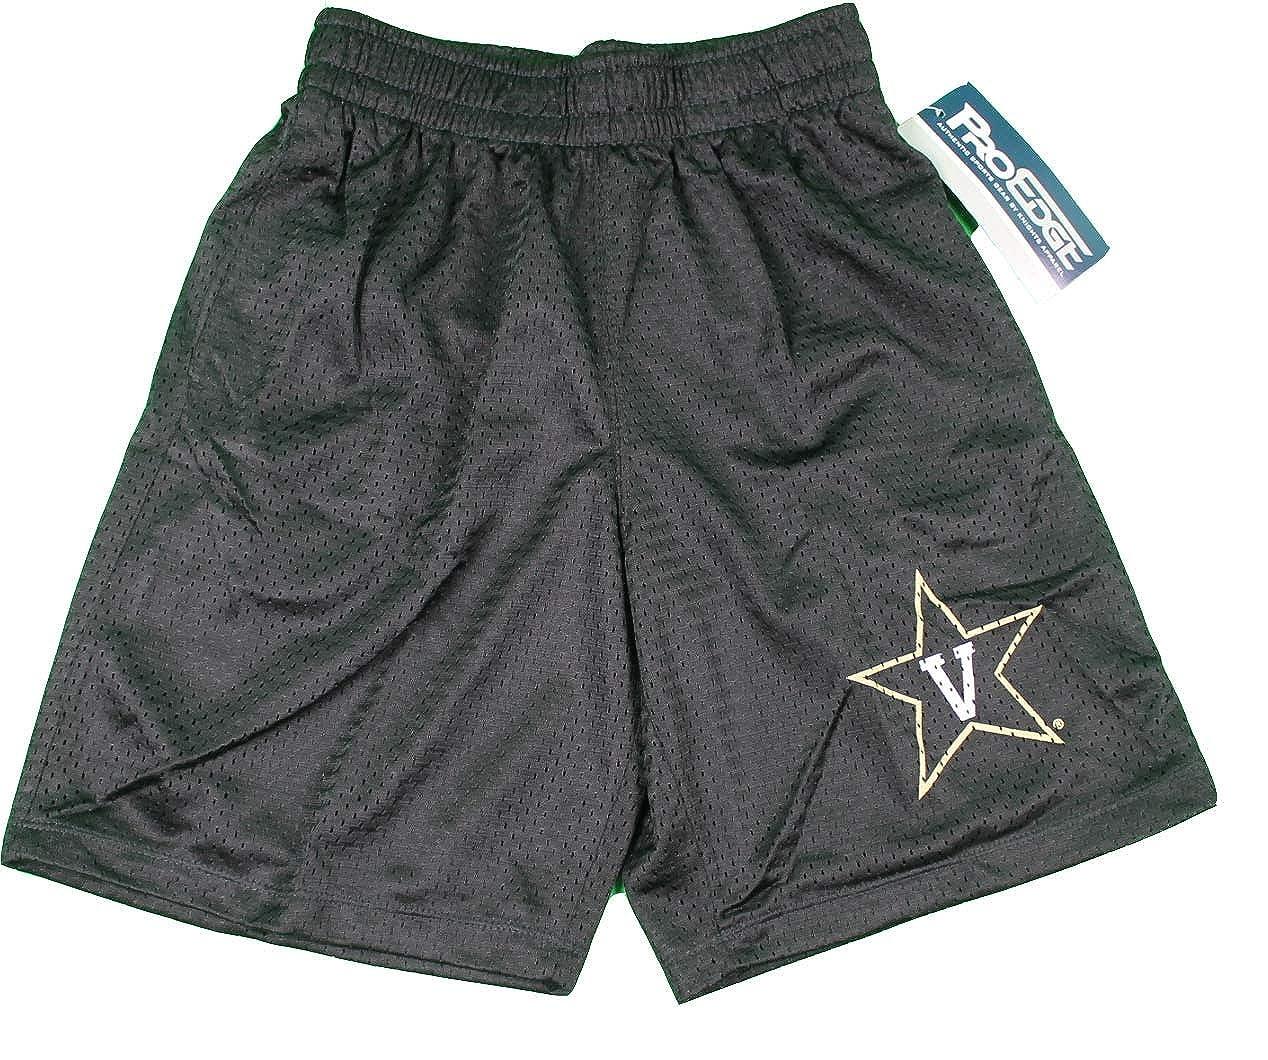 NCAA Vanderbilt University Boys Pull on Shorts with Pocket